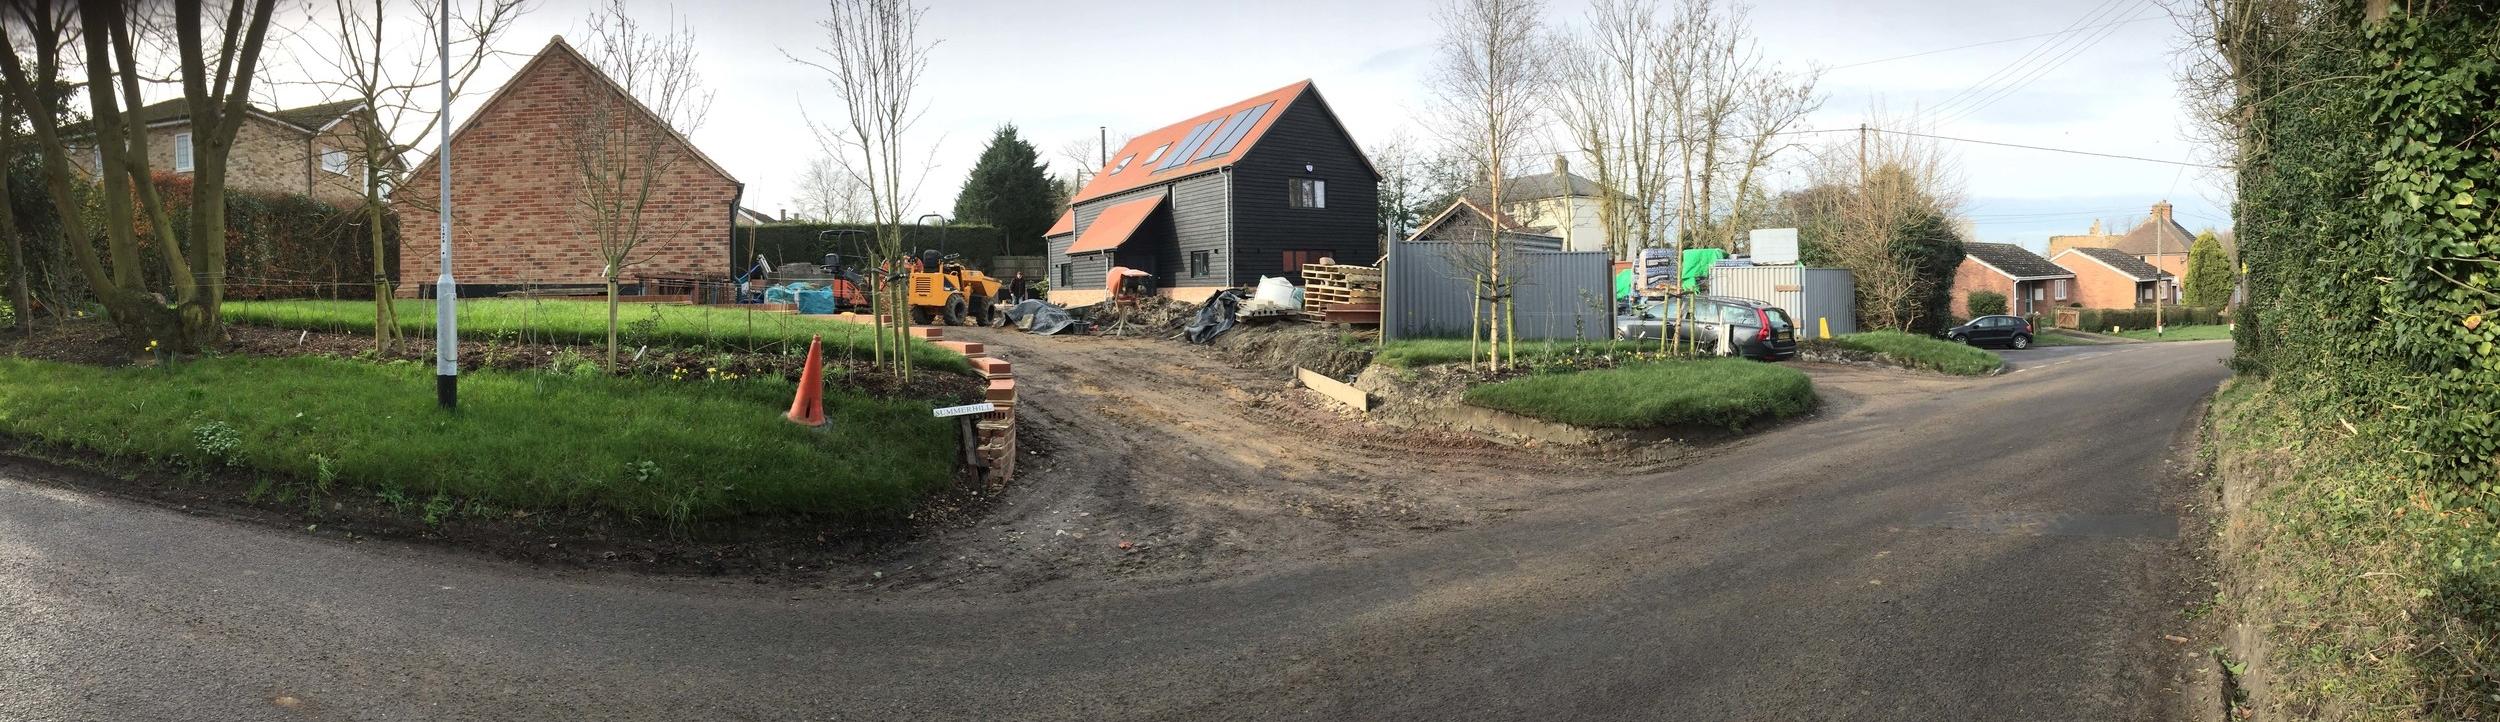 architects-cambridge-new-build-foundations-2.jpg